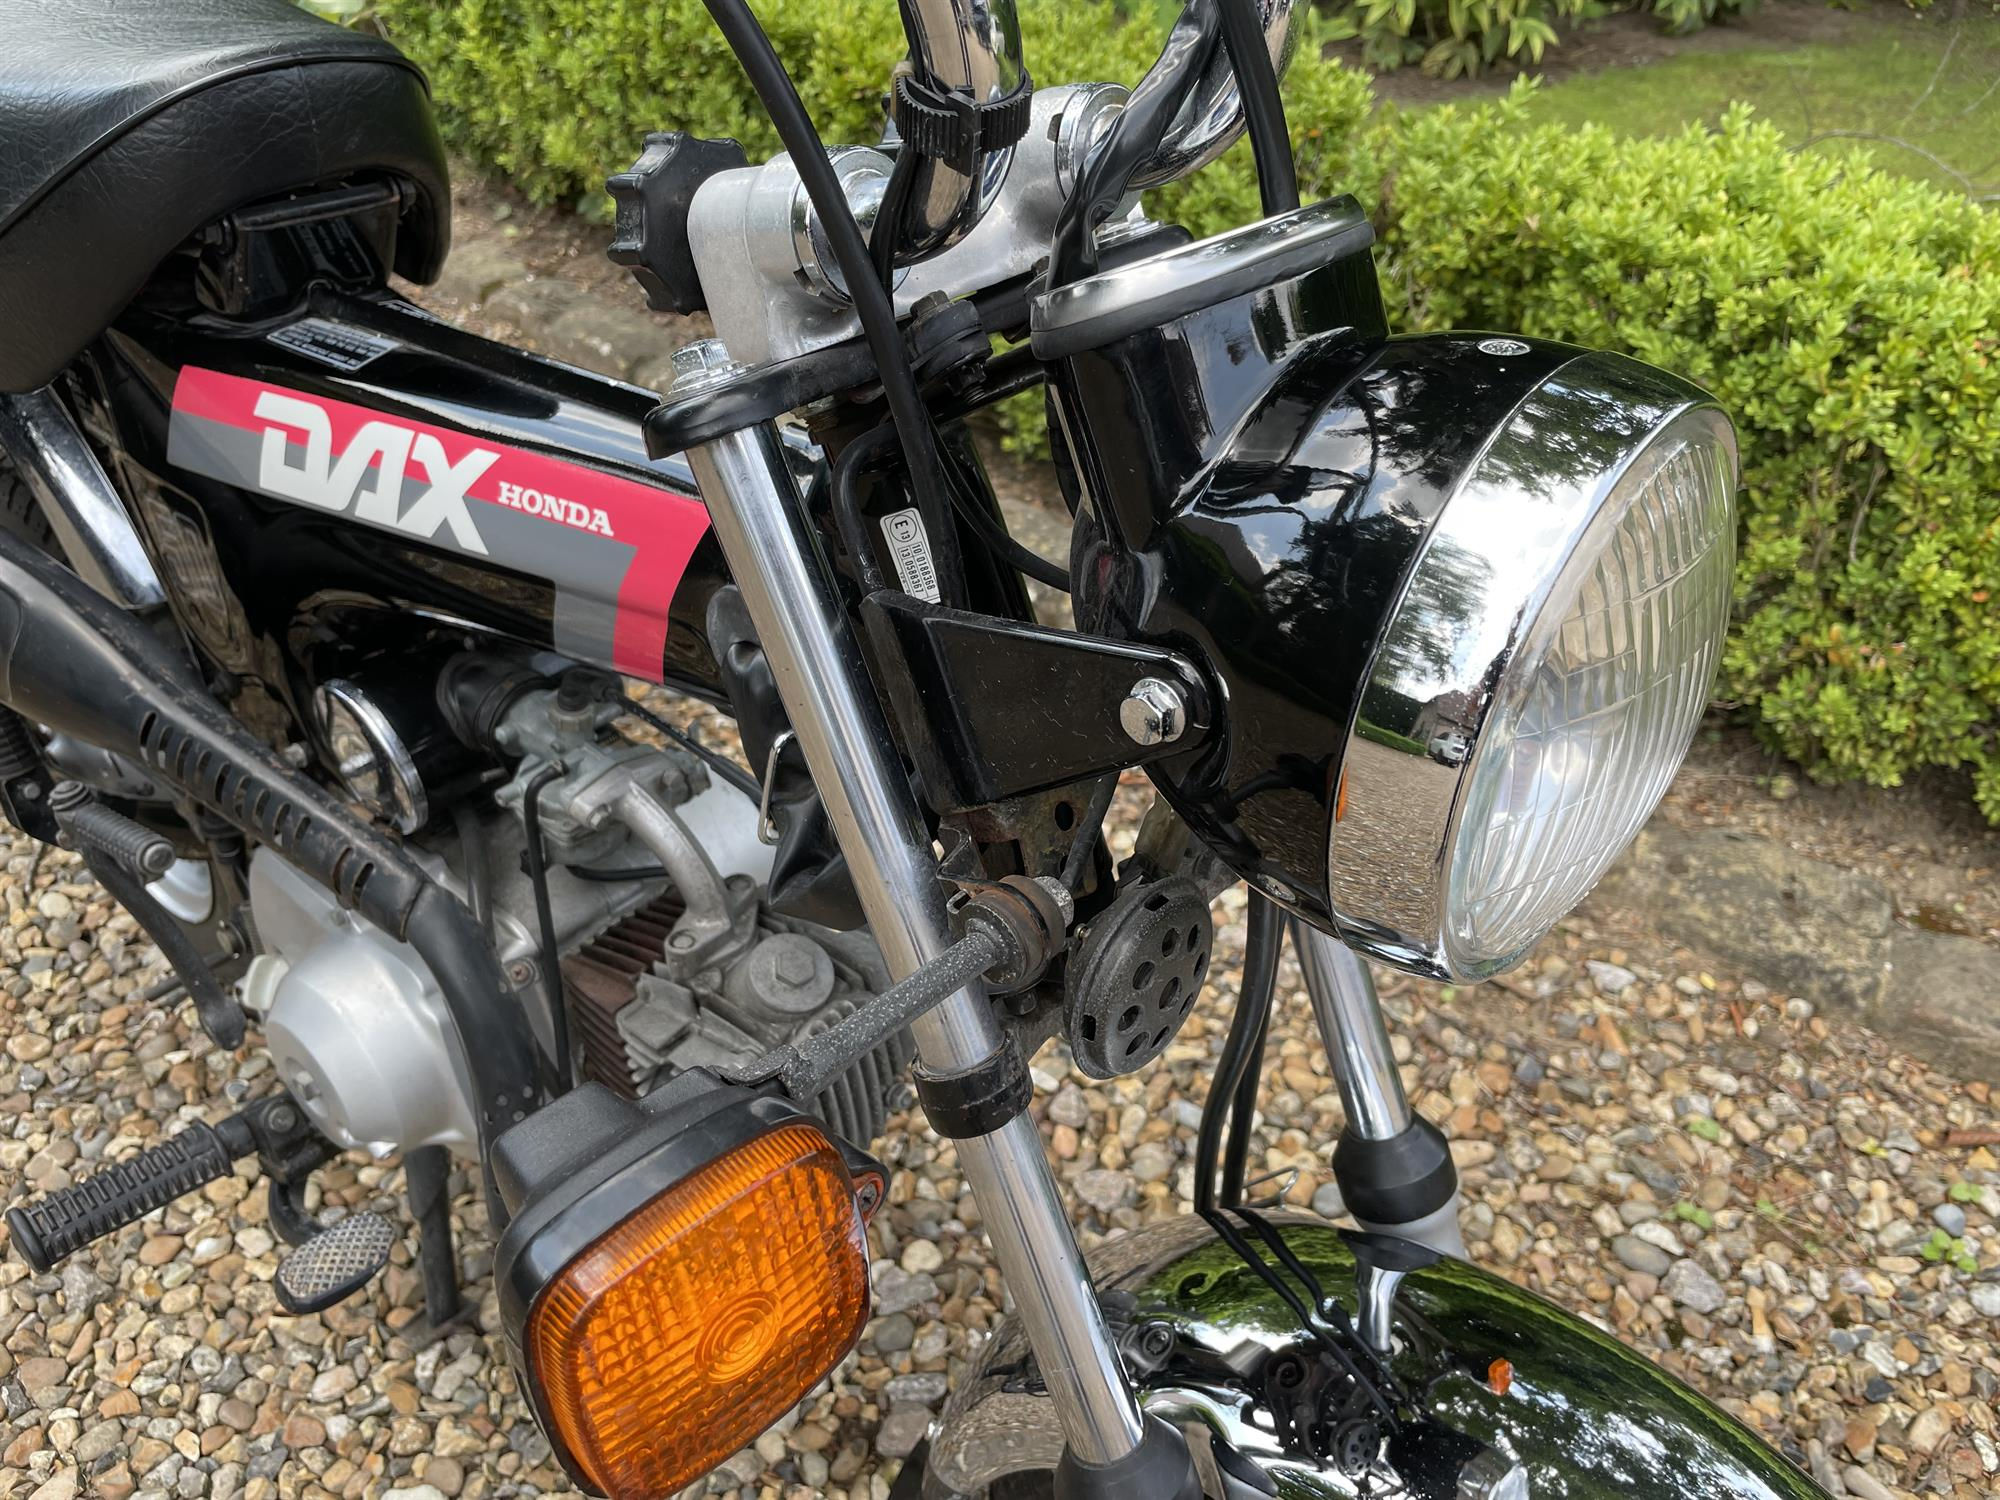 1993 Honda ST50 Dax - Image 7 of 11